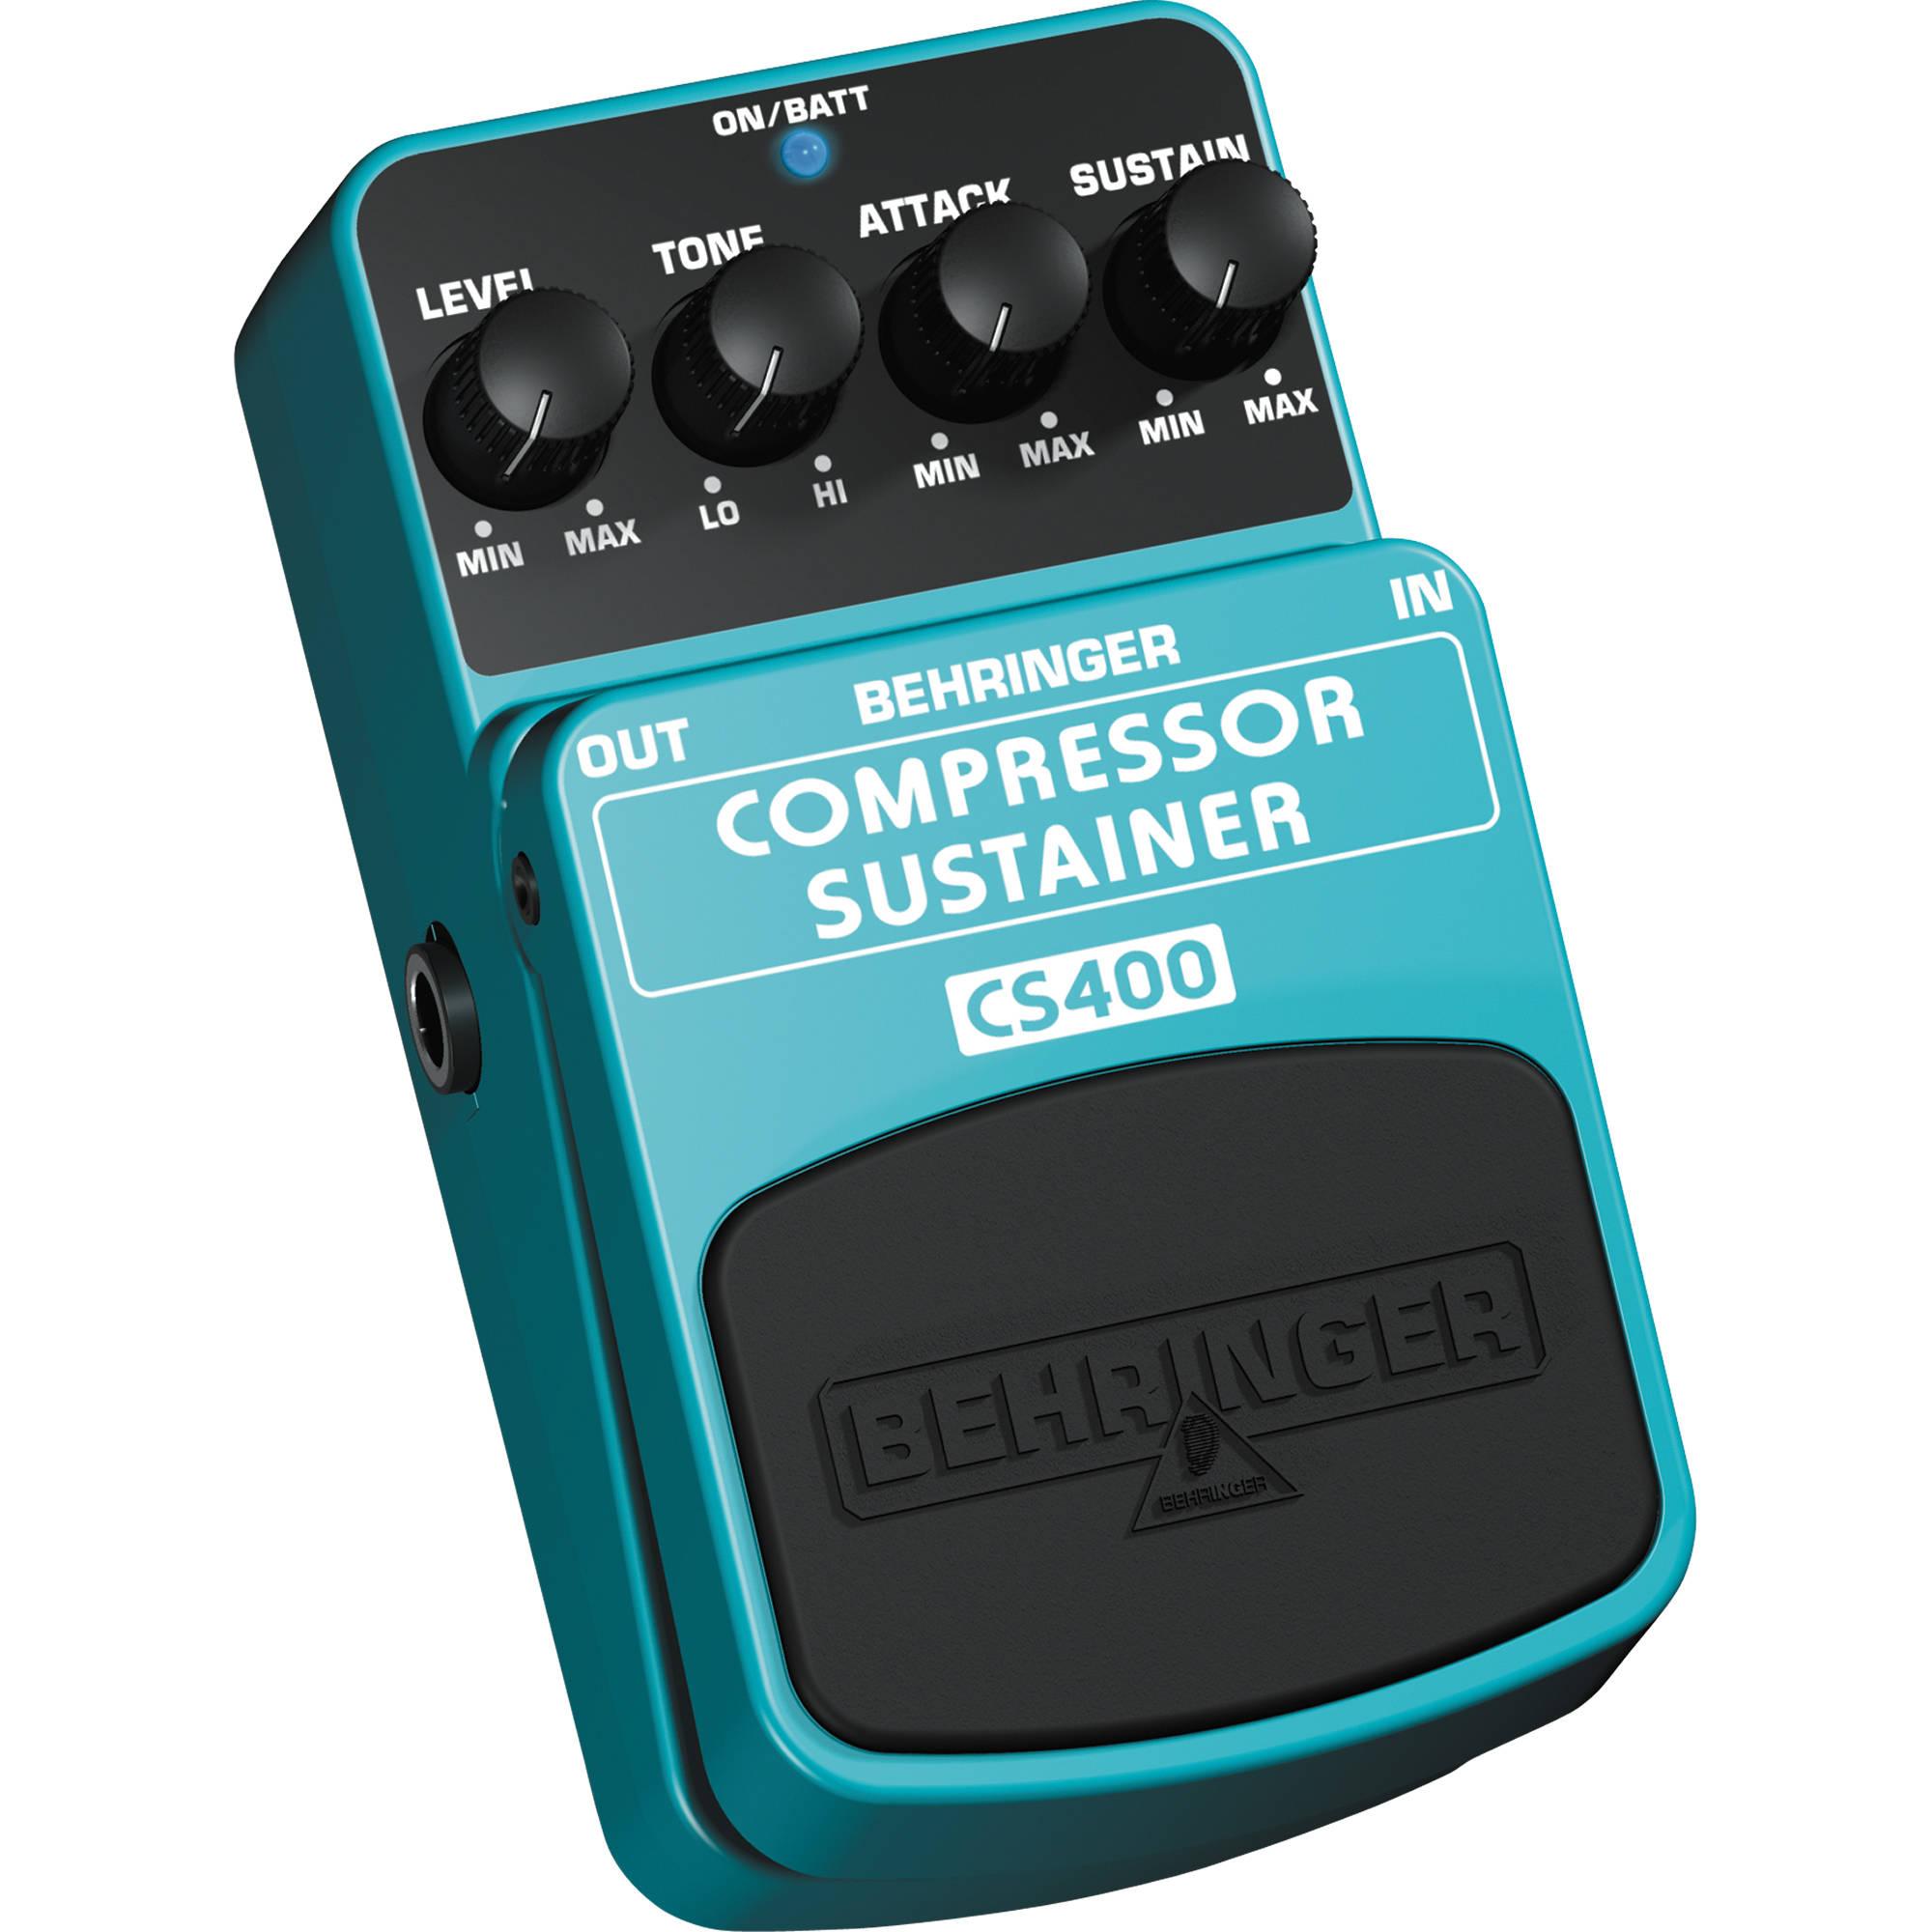 behringer cs400 compressor sustain guitar pedal cs400 b h photo. Black Bedroom Furniture Sets. Home Design Ideas